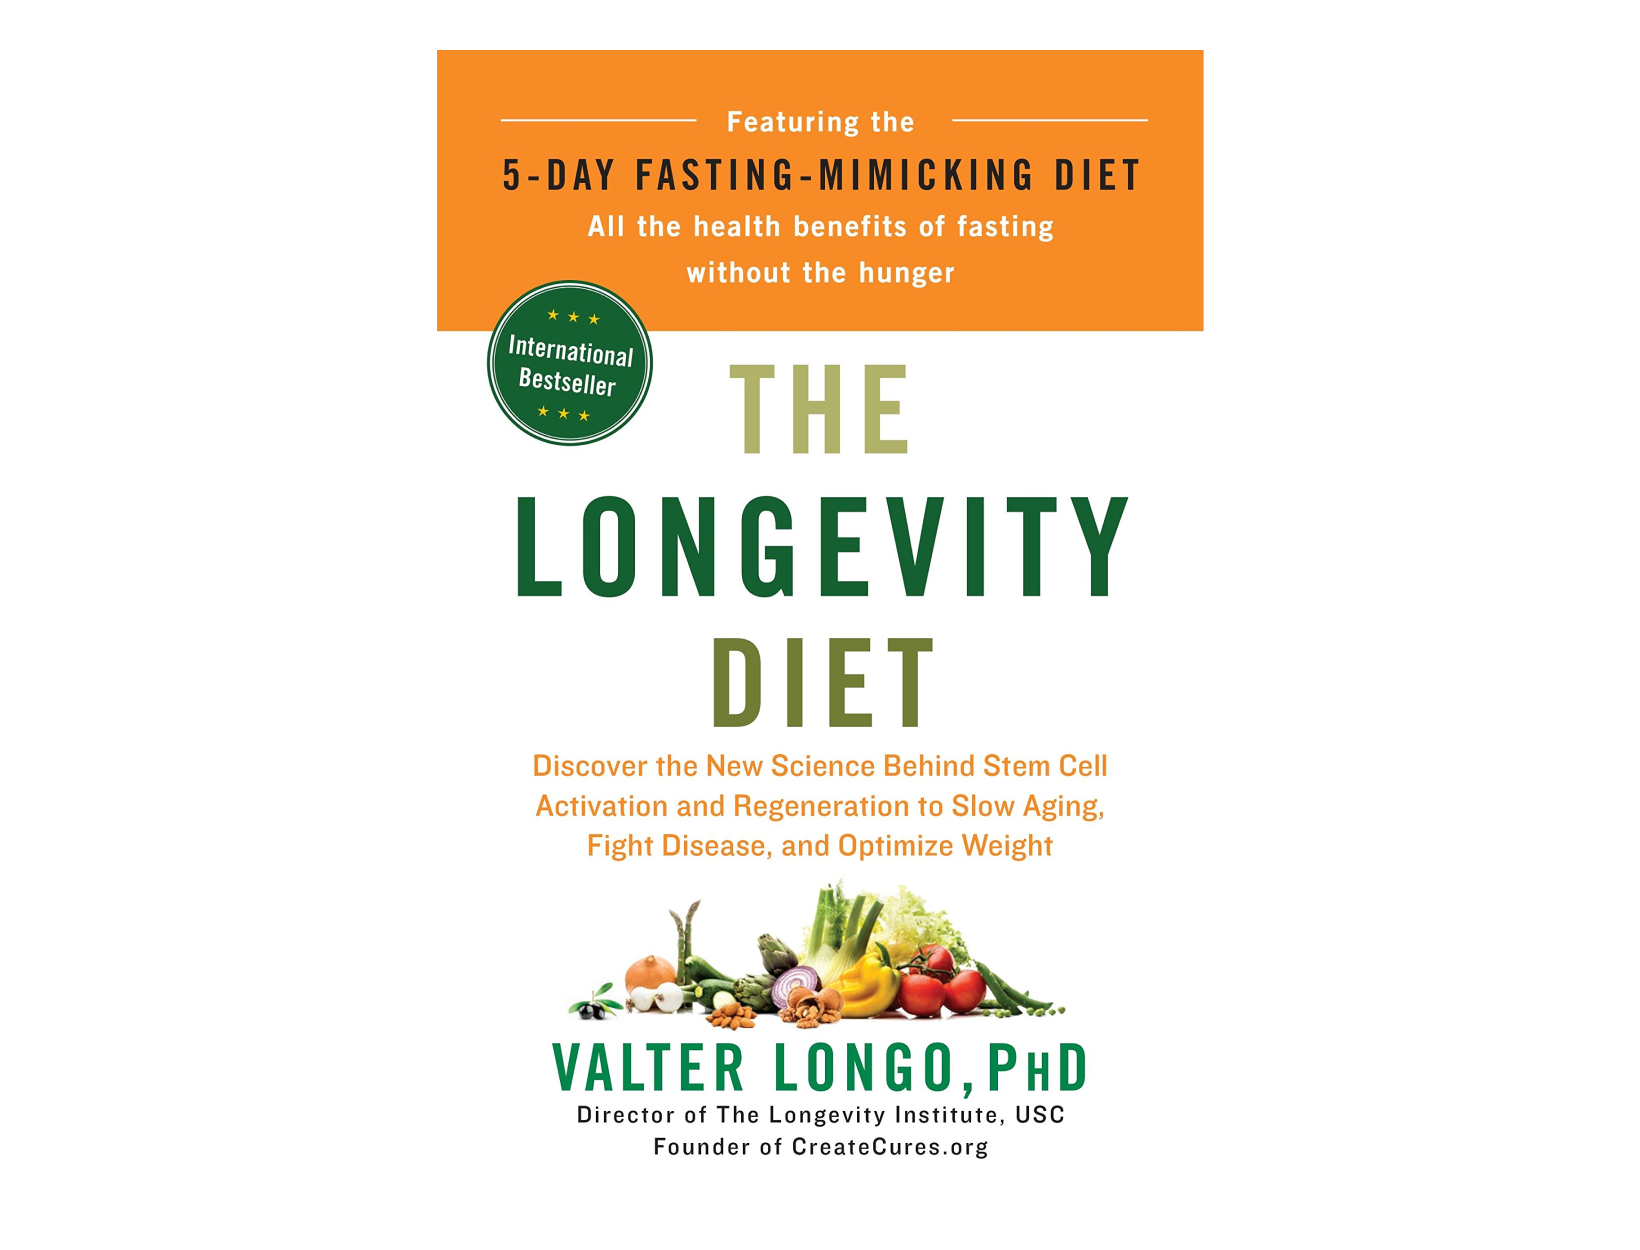 <em>The Longevity Diet</em> by Valter Longo, PhD